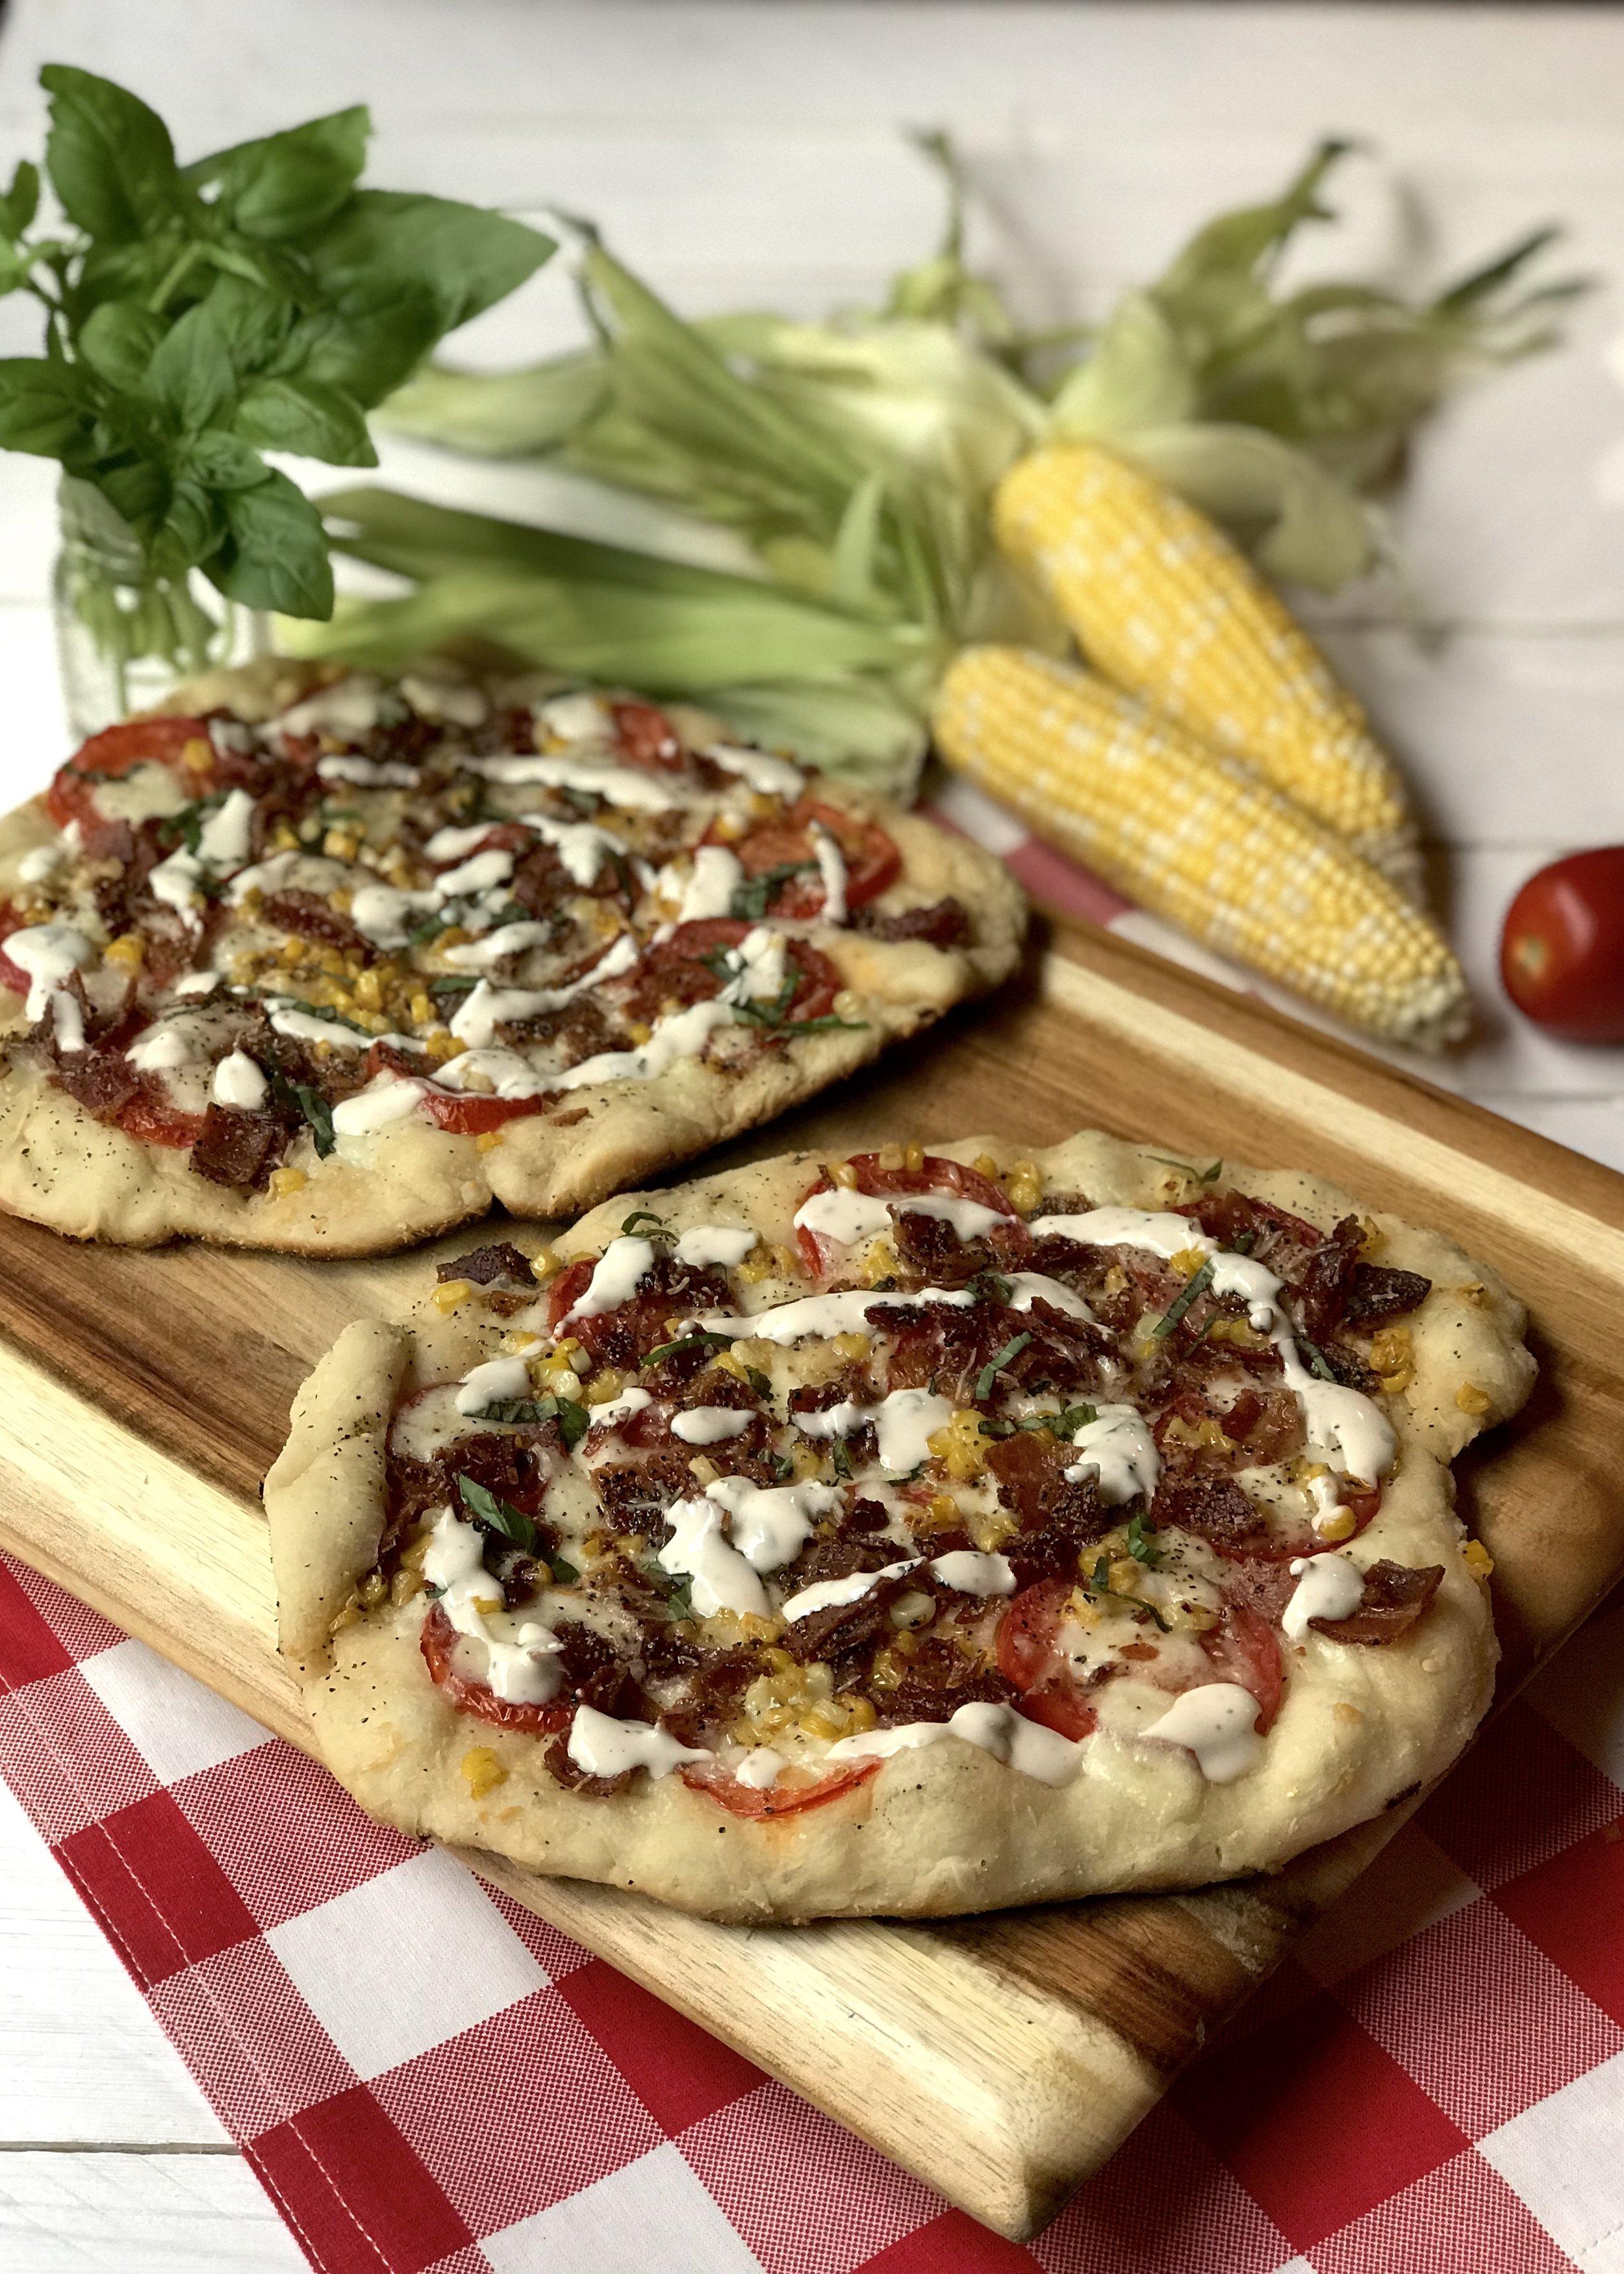 Iowa Summer Pizza. Photo credit: Anita McVey